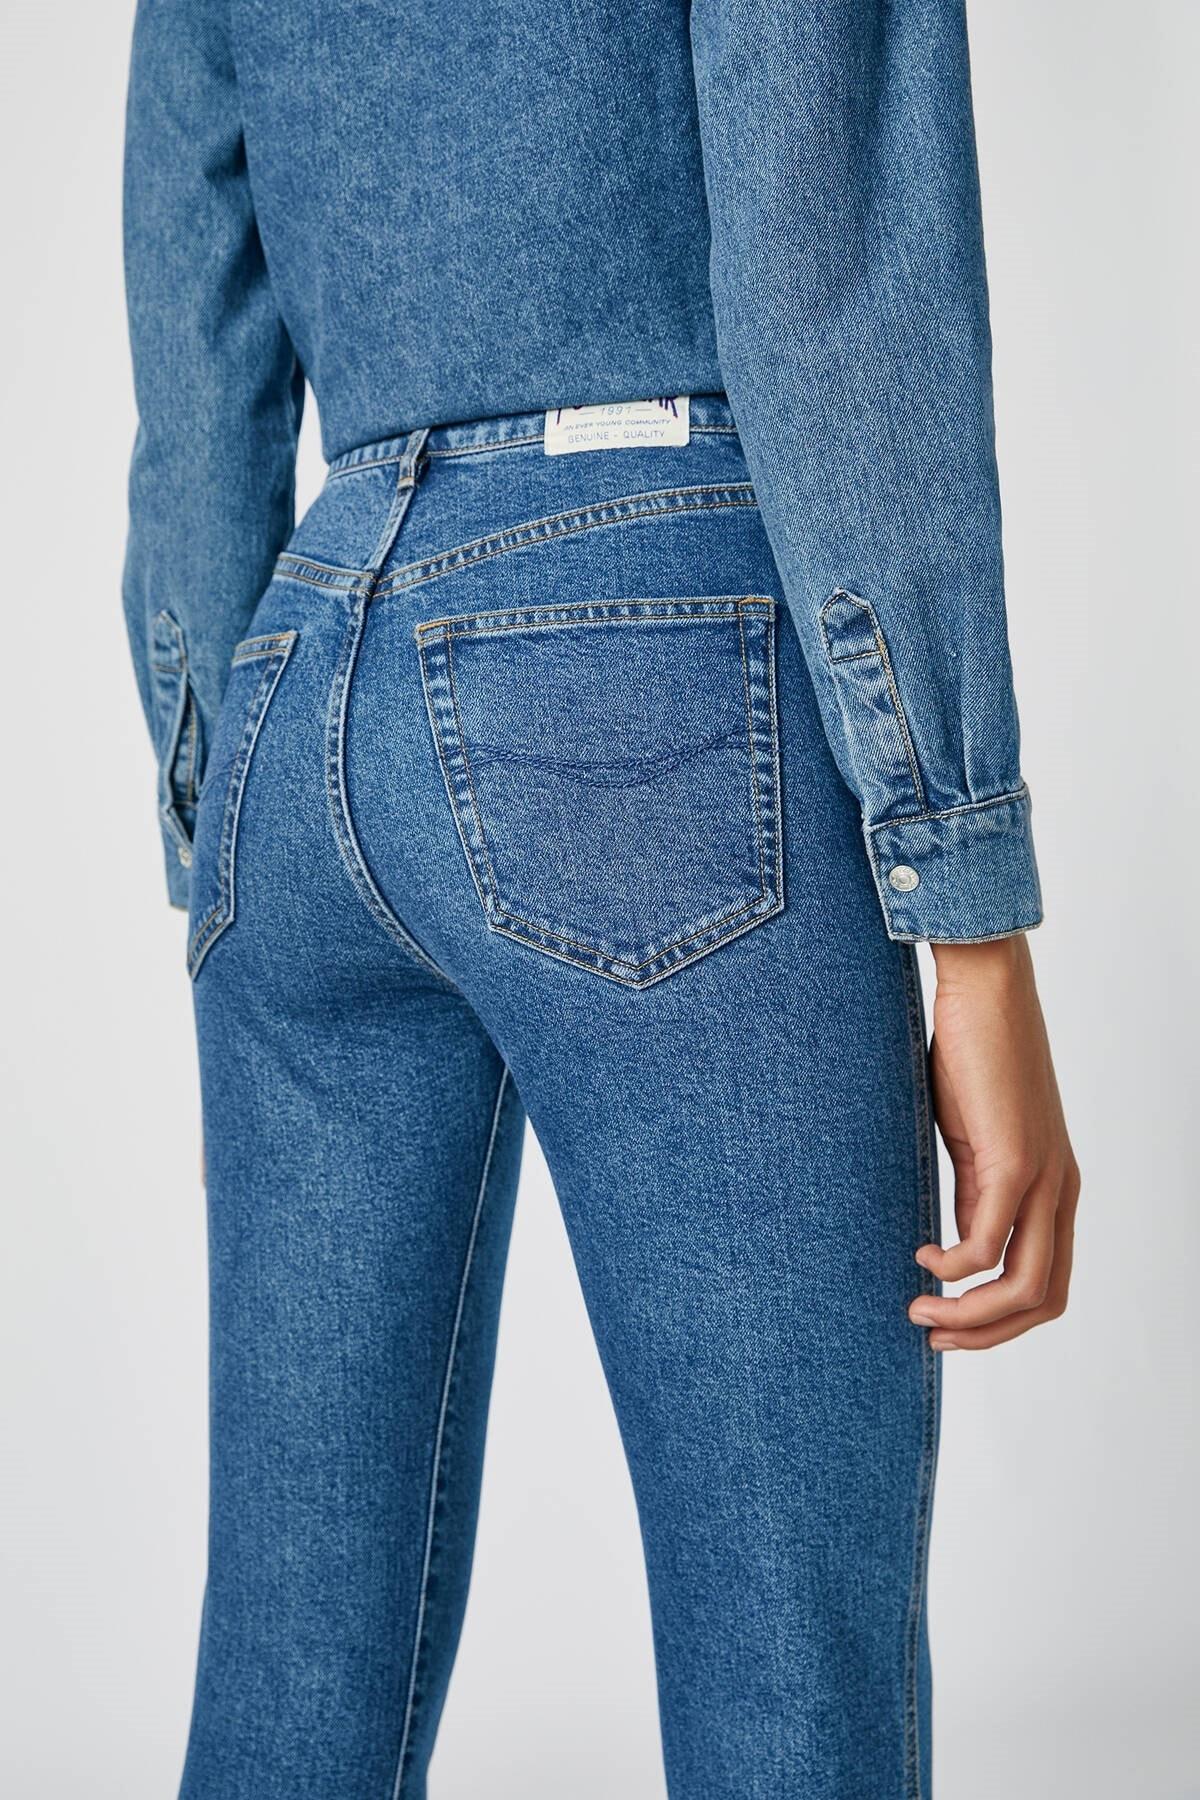 Pull & Bear Kadın Mavi Comfort Slim Fit Mom Jean 05682305 2